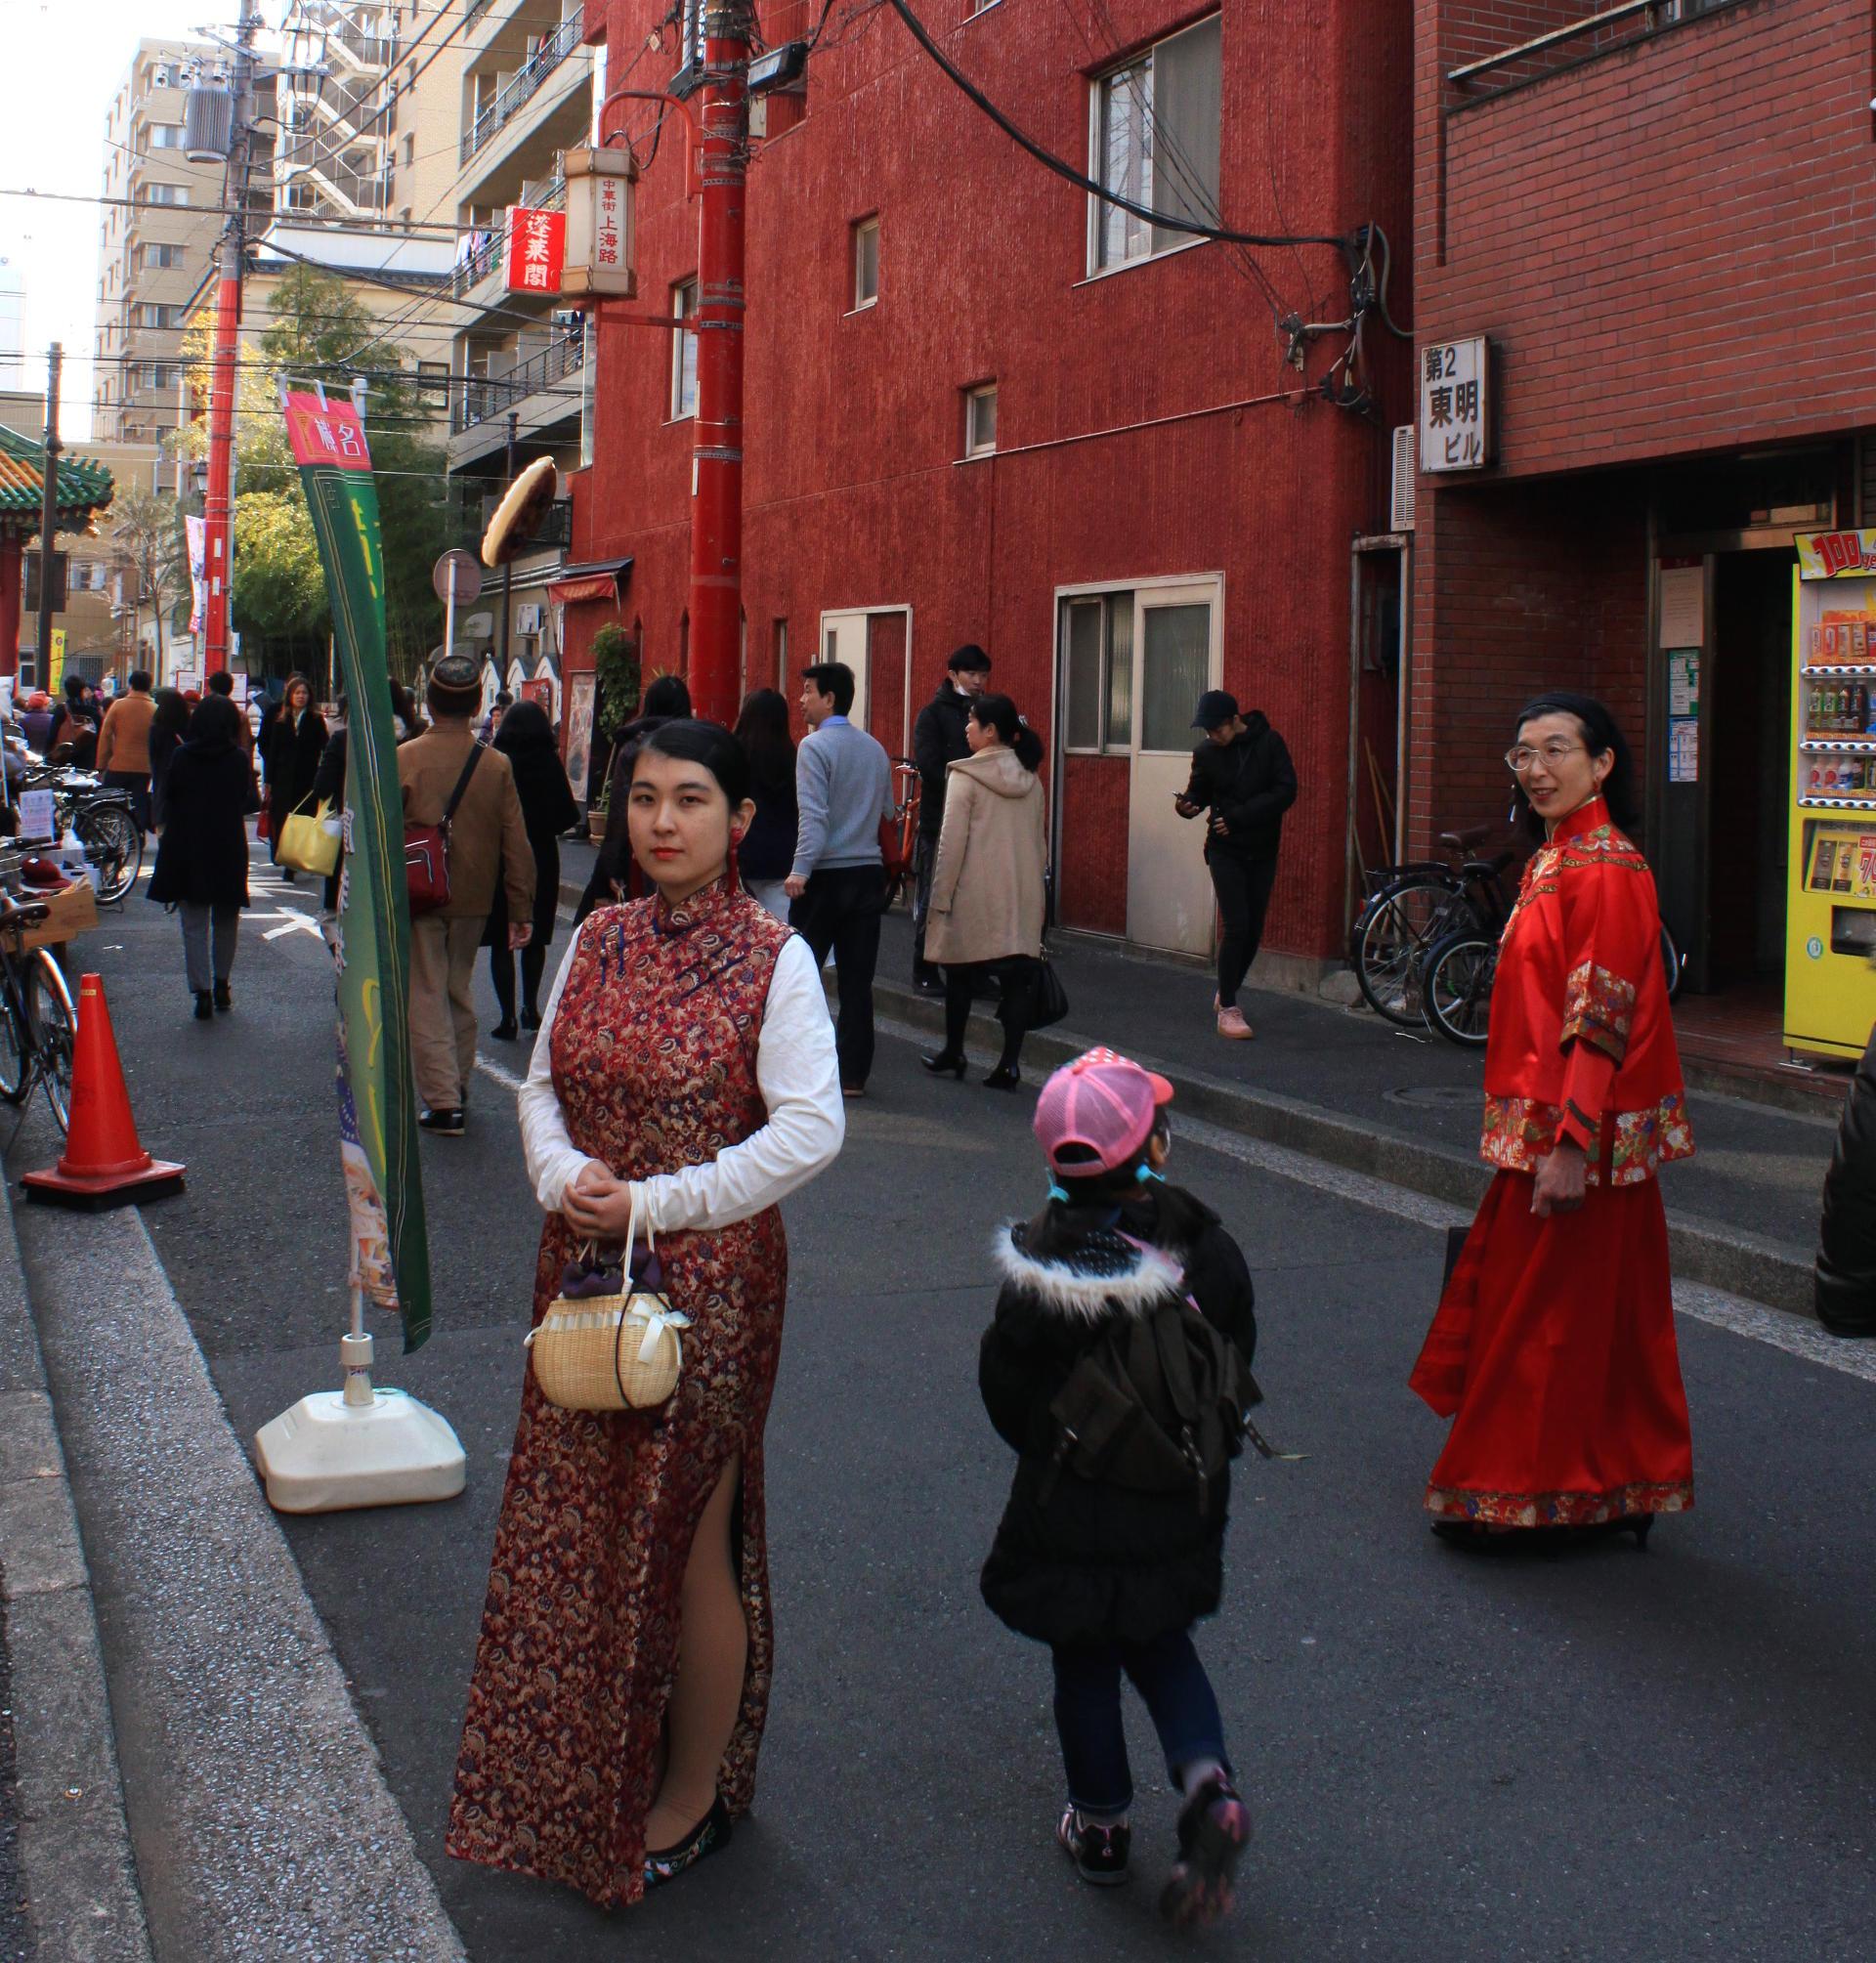 yokohama kobiety chinatown chinska dzielnica iglawpodrozy